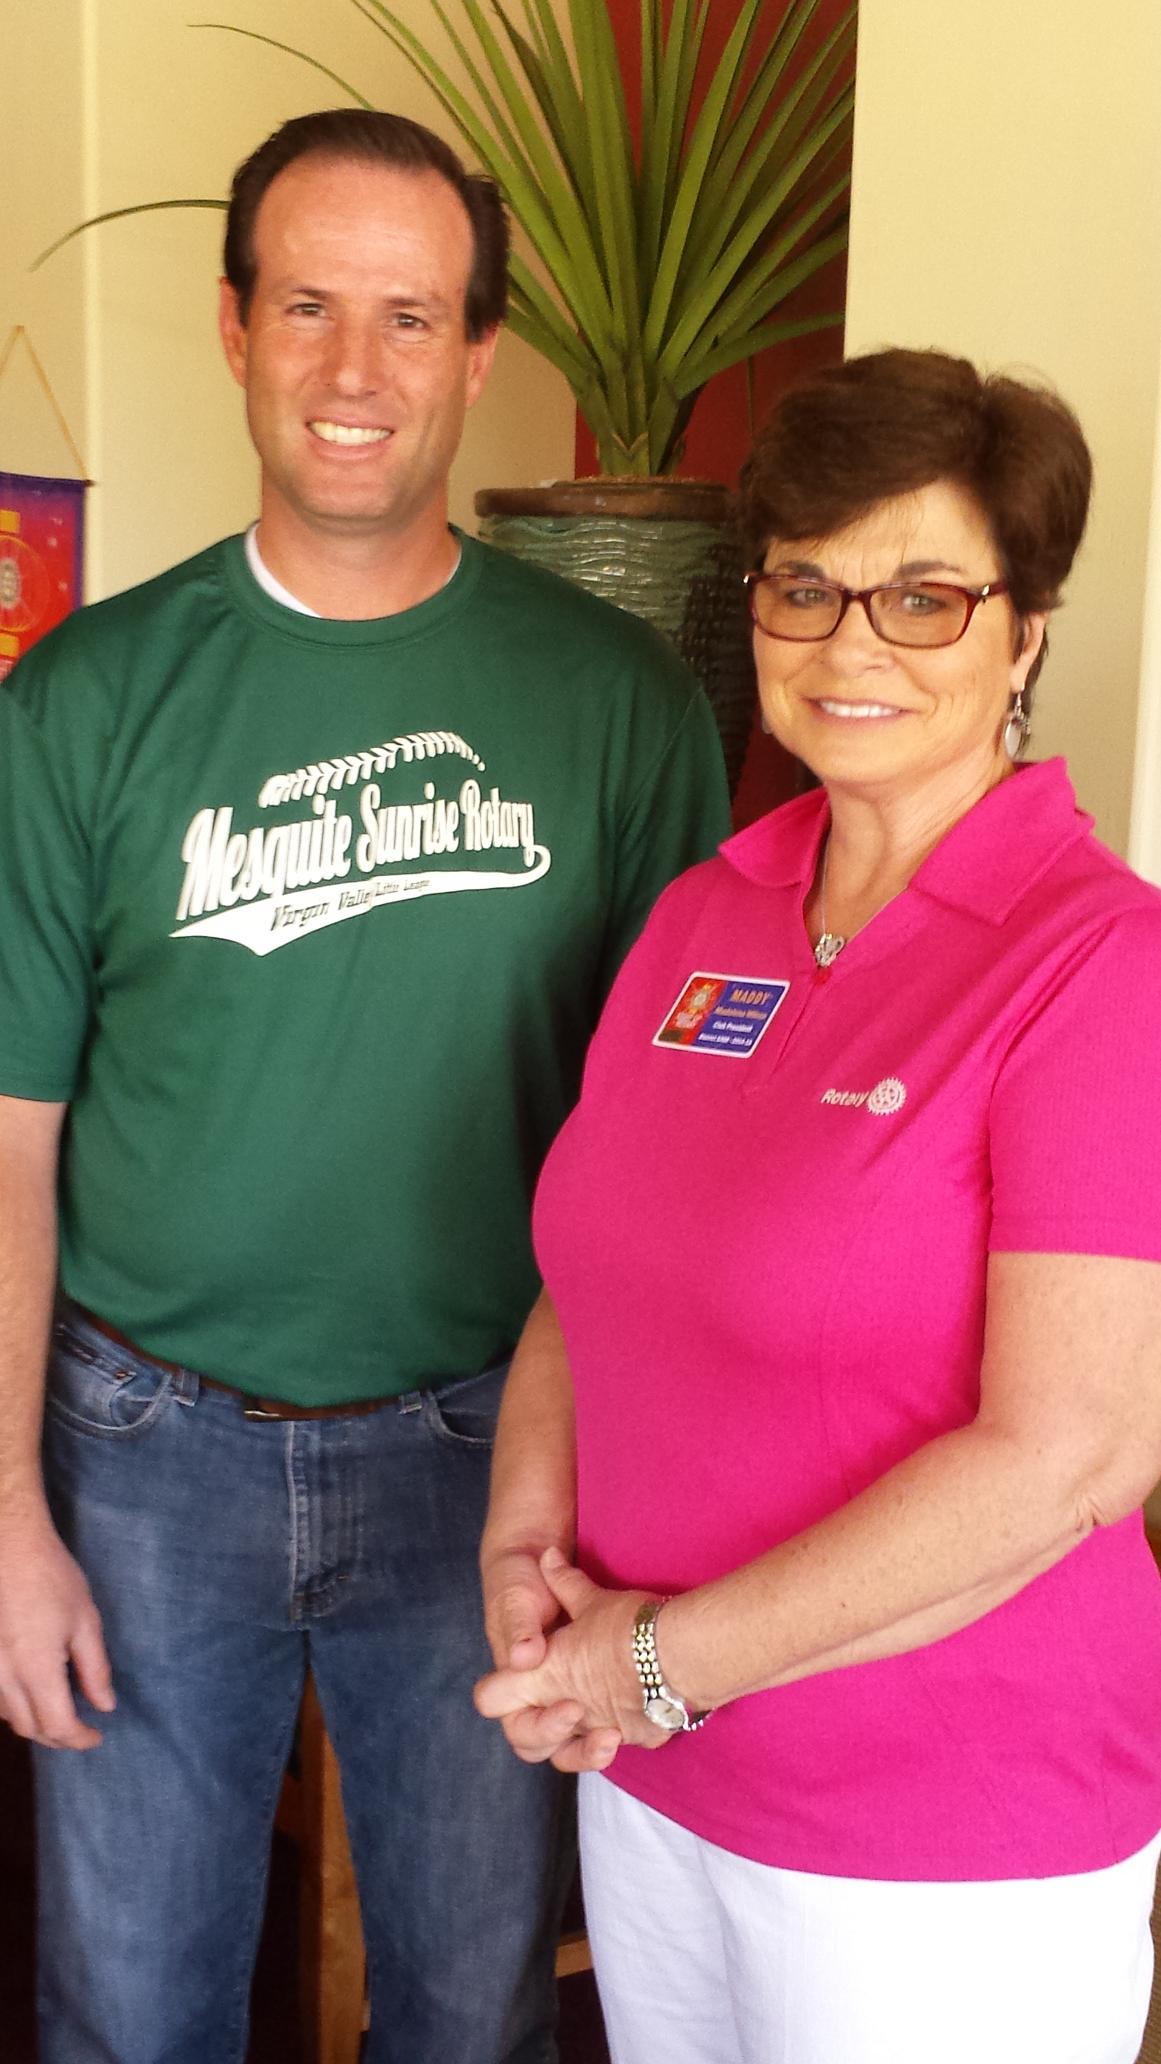 Little League Coach Speaks To Sunrise Rotary Club Members